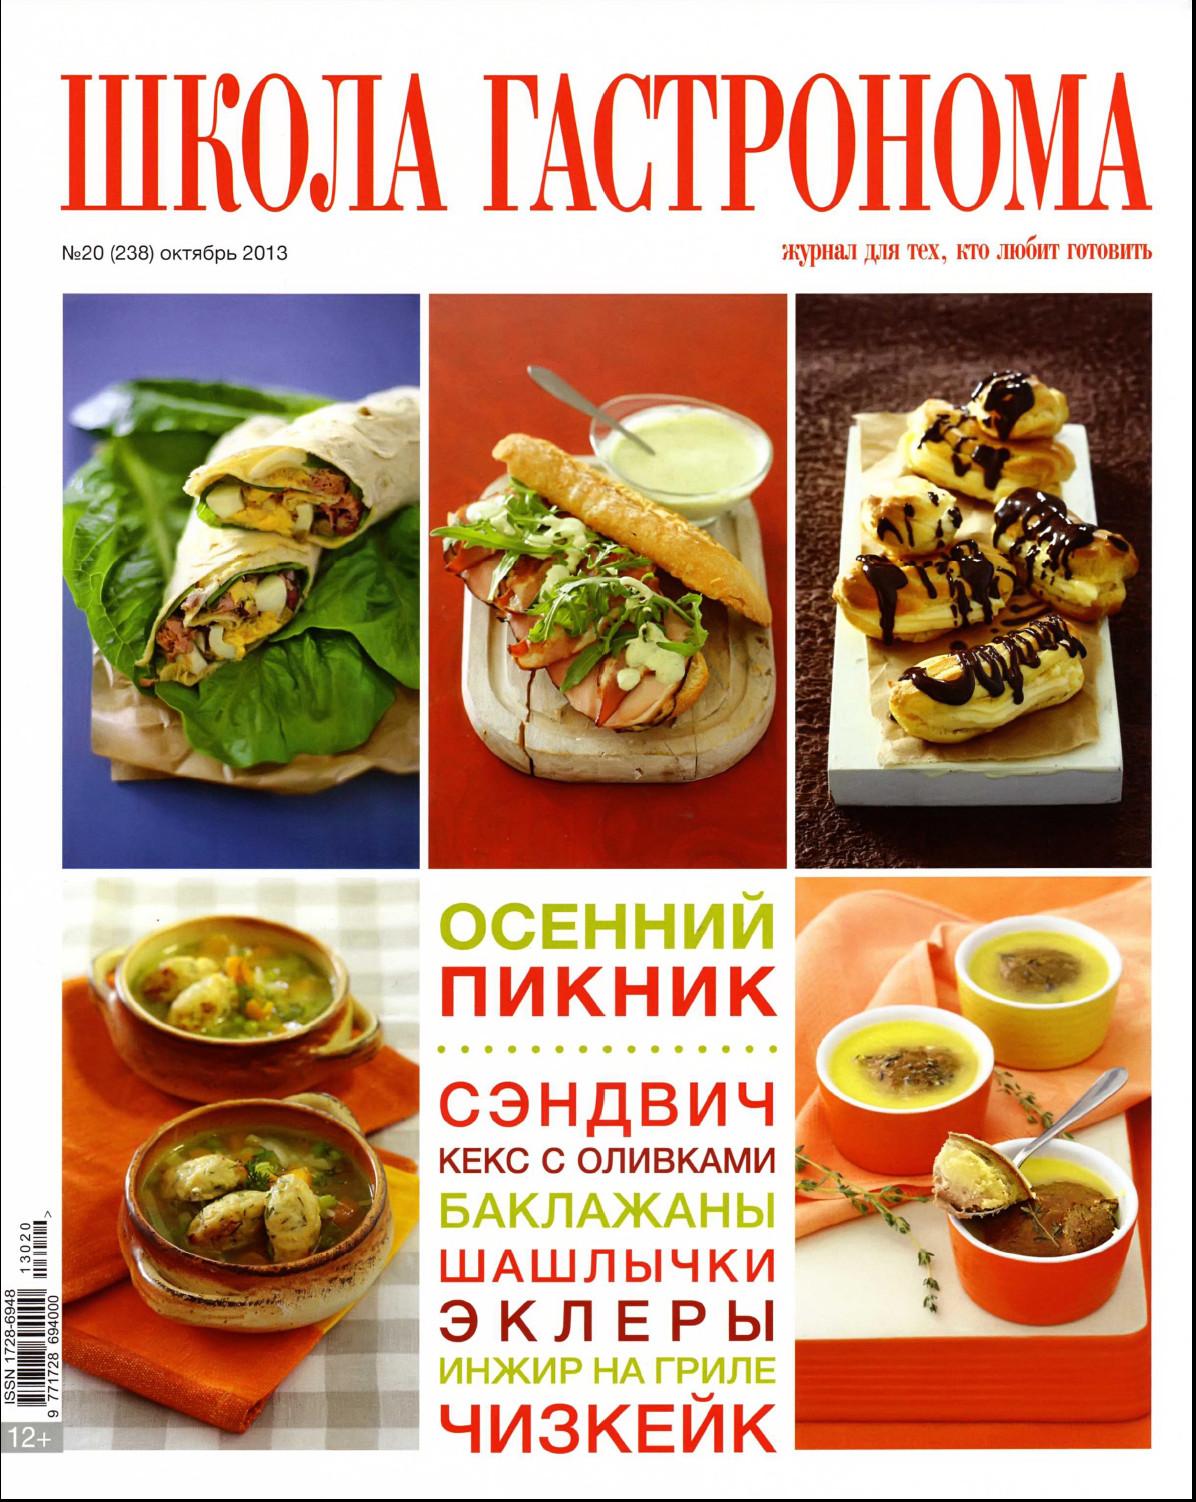 SHkola gastronoma    20 2013 goda Школа гастронома